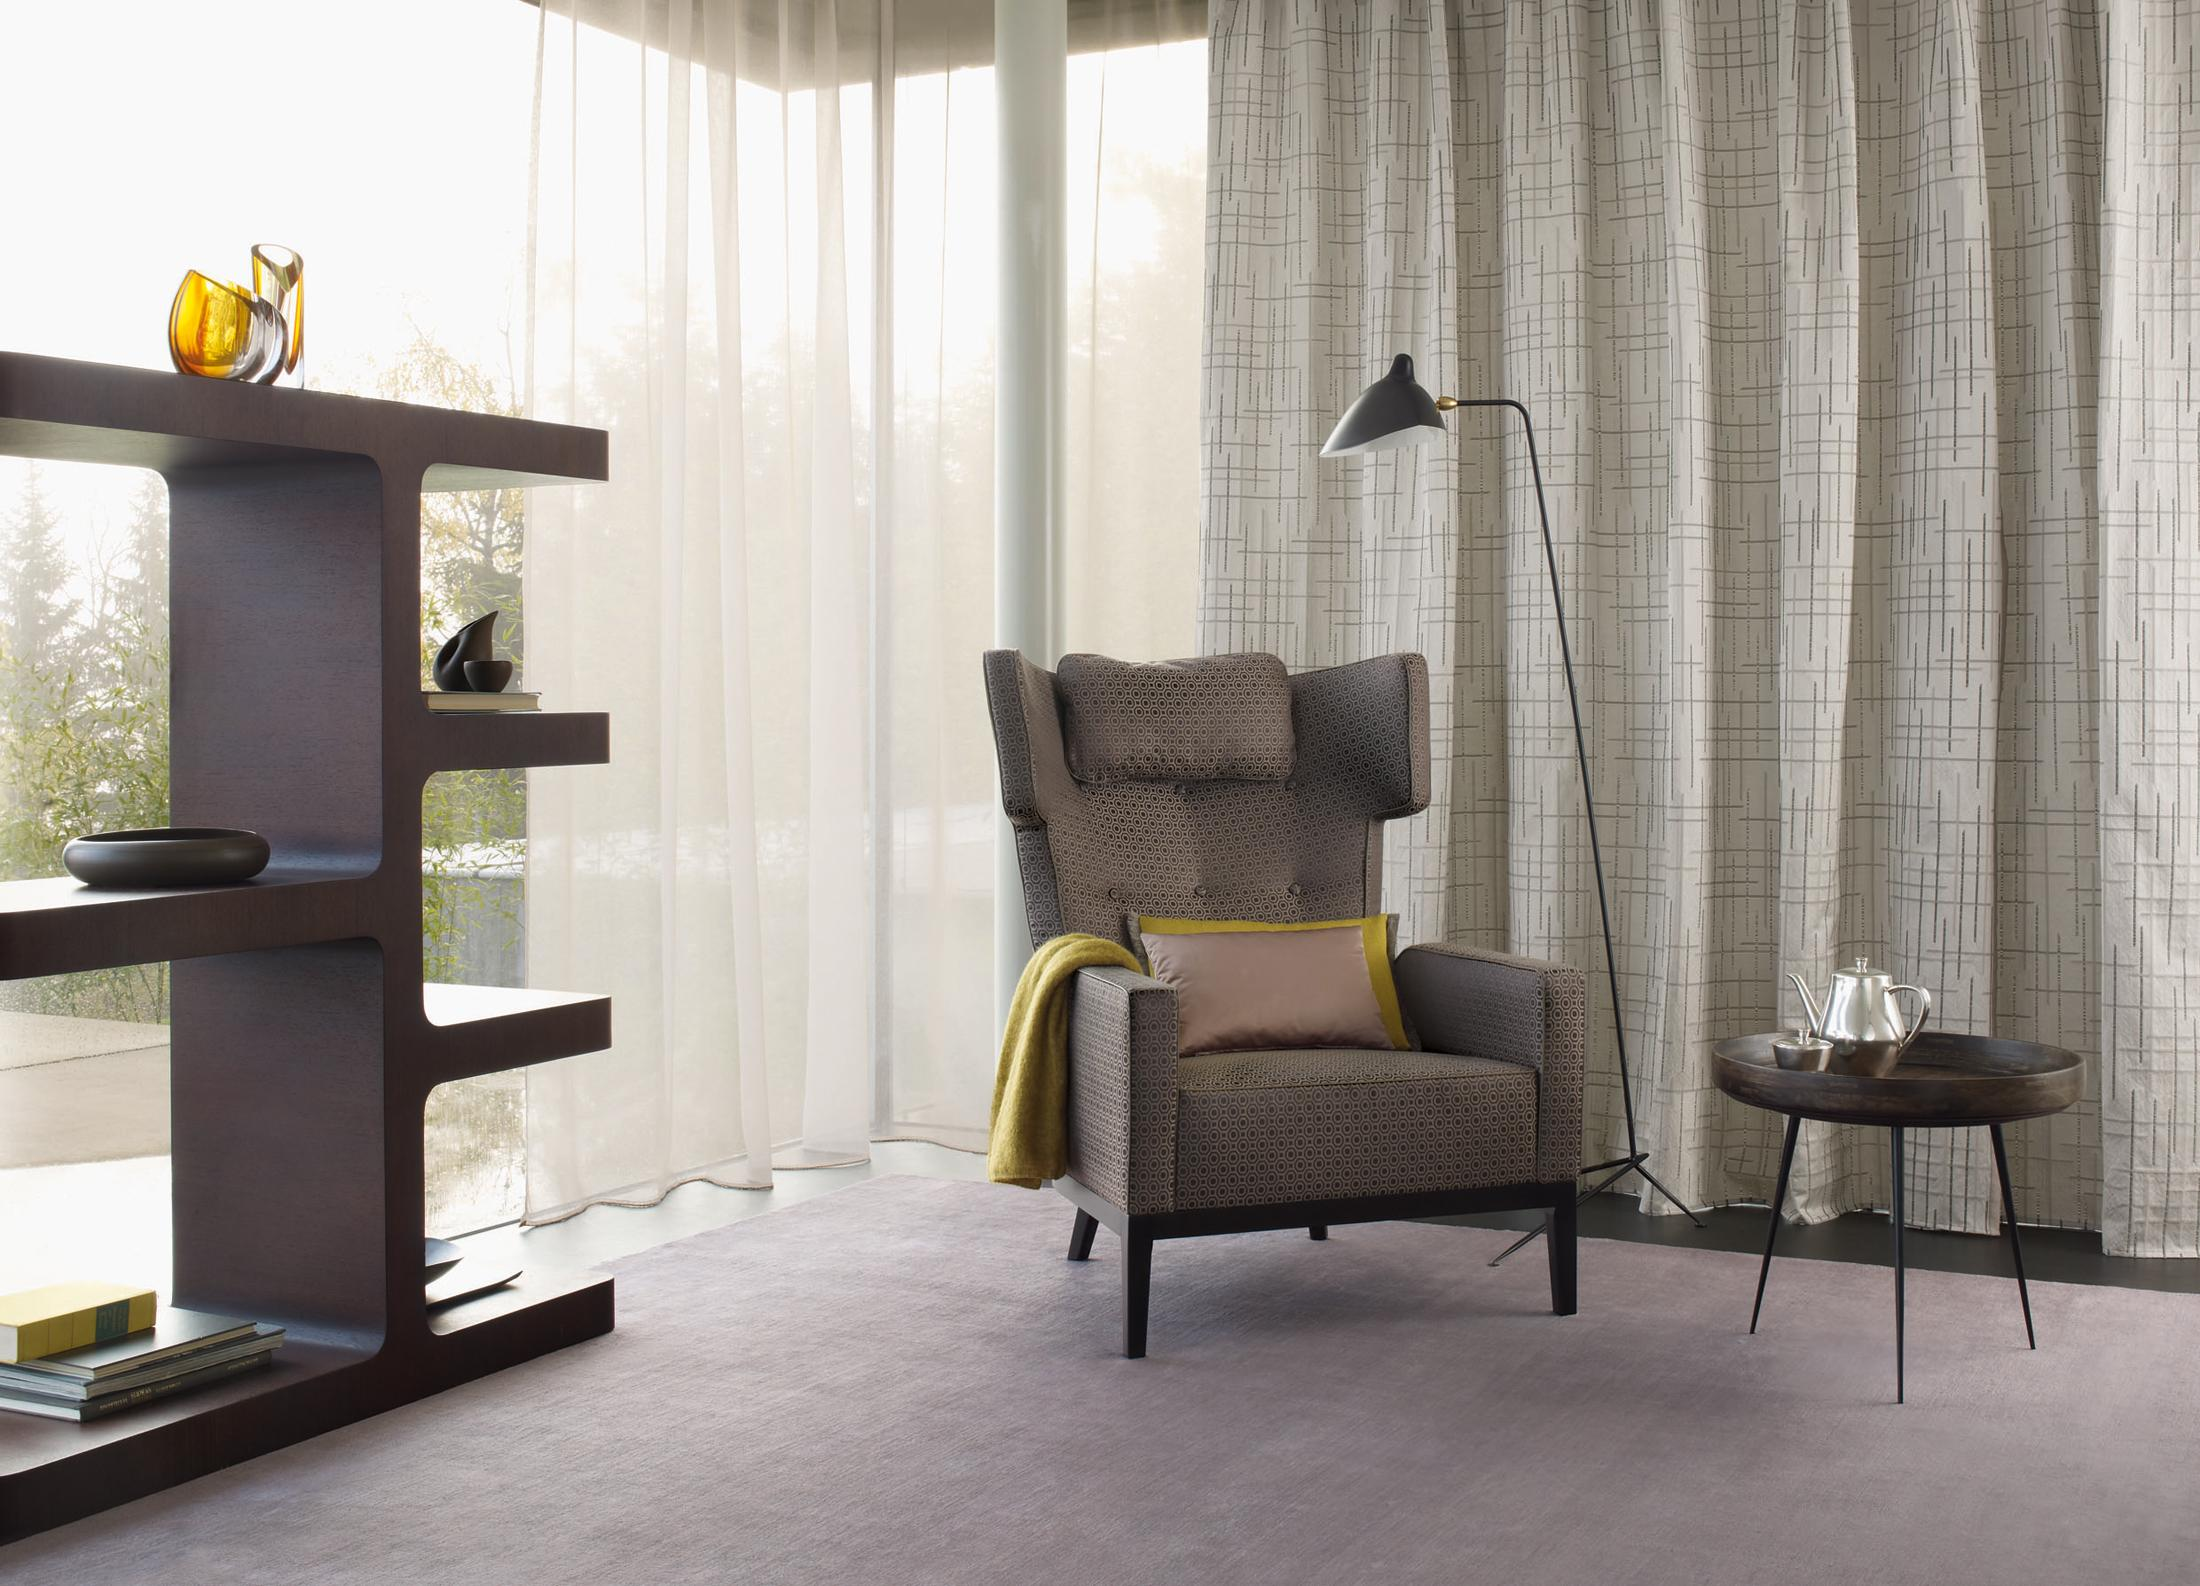 ohrensessel im retro look fensterfront beistelltis. Black Bedroom Furniture Sets. Home Design Ideas